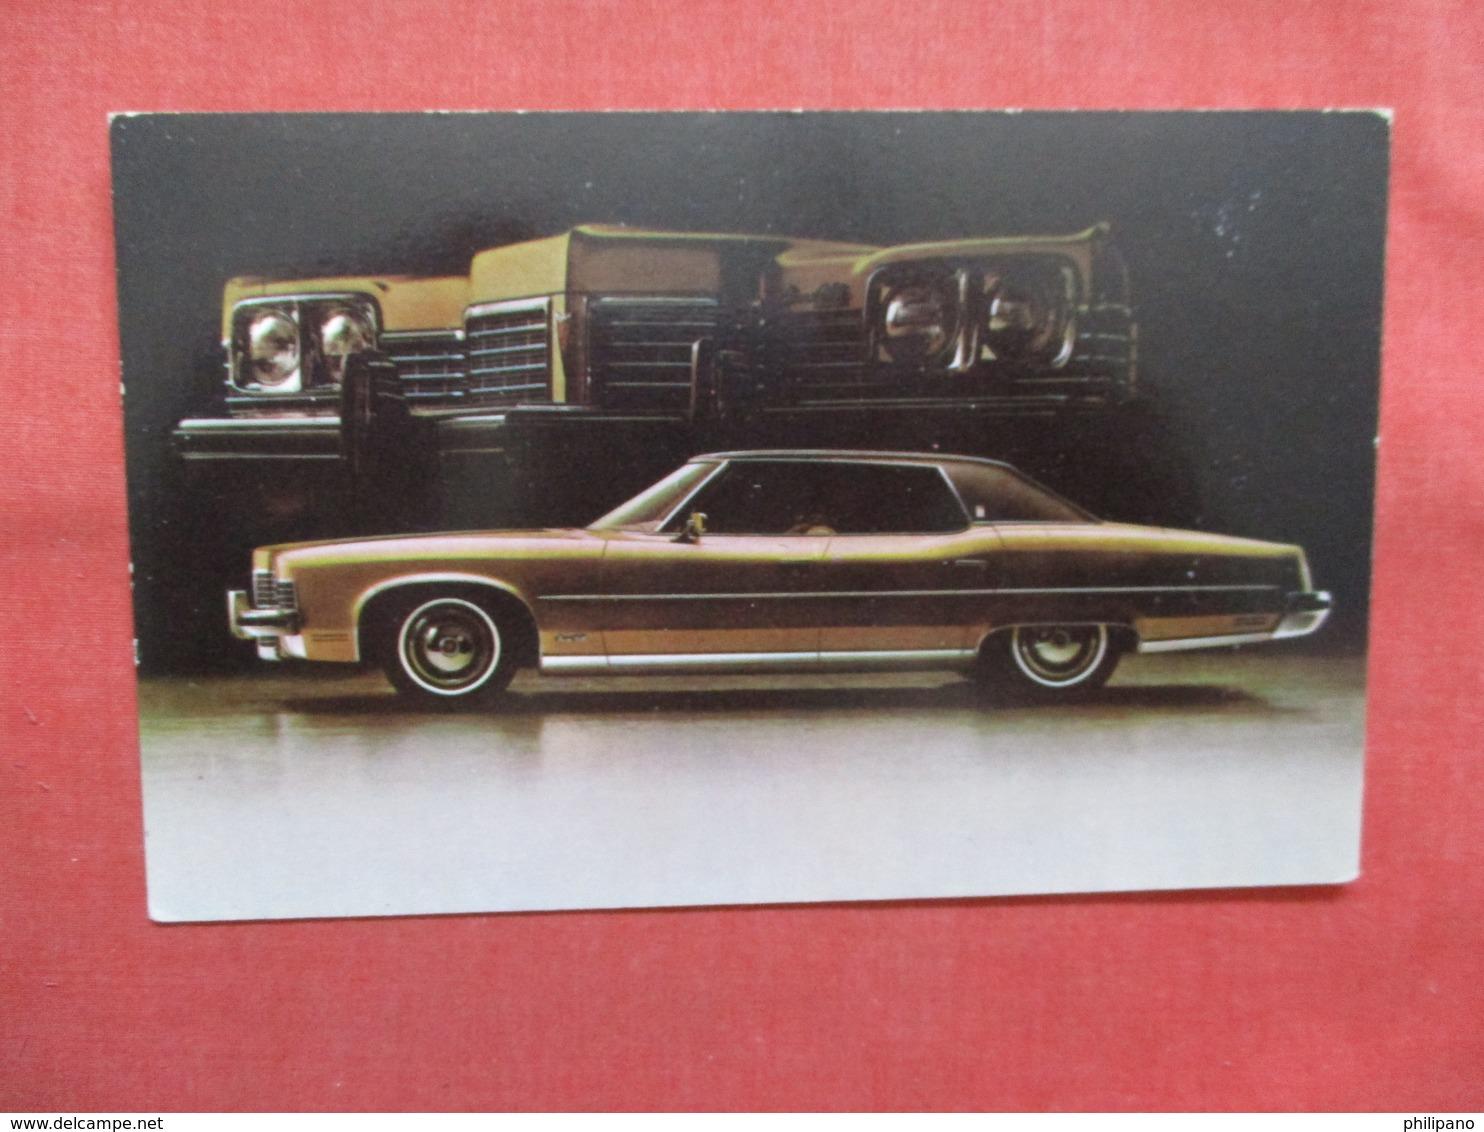 1973 Grand Ville 4 Dr Hardtop   >  Ref    3561 - Passenger Cars